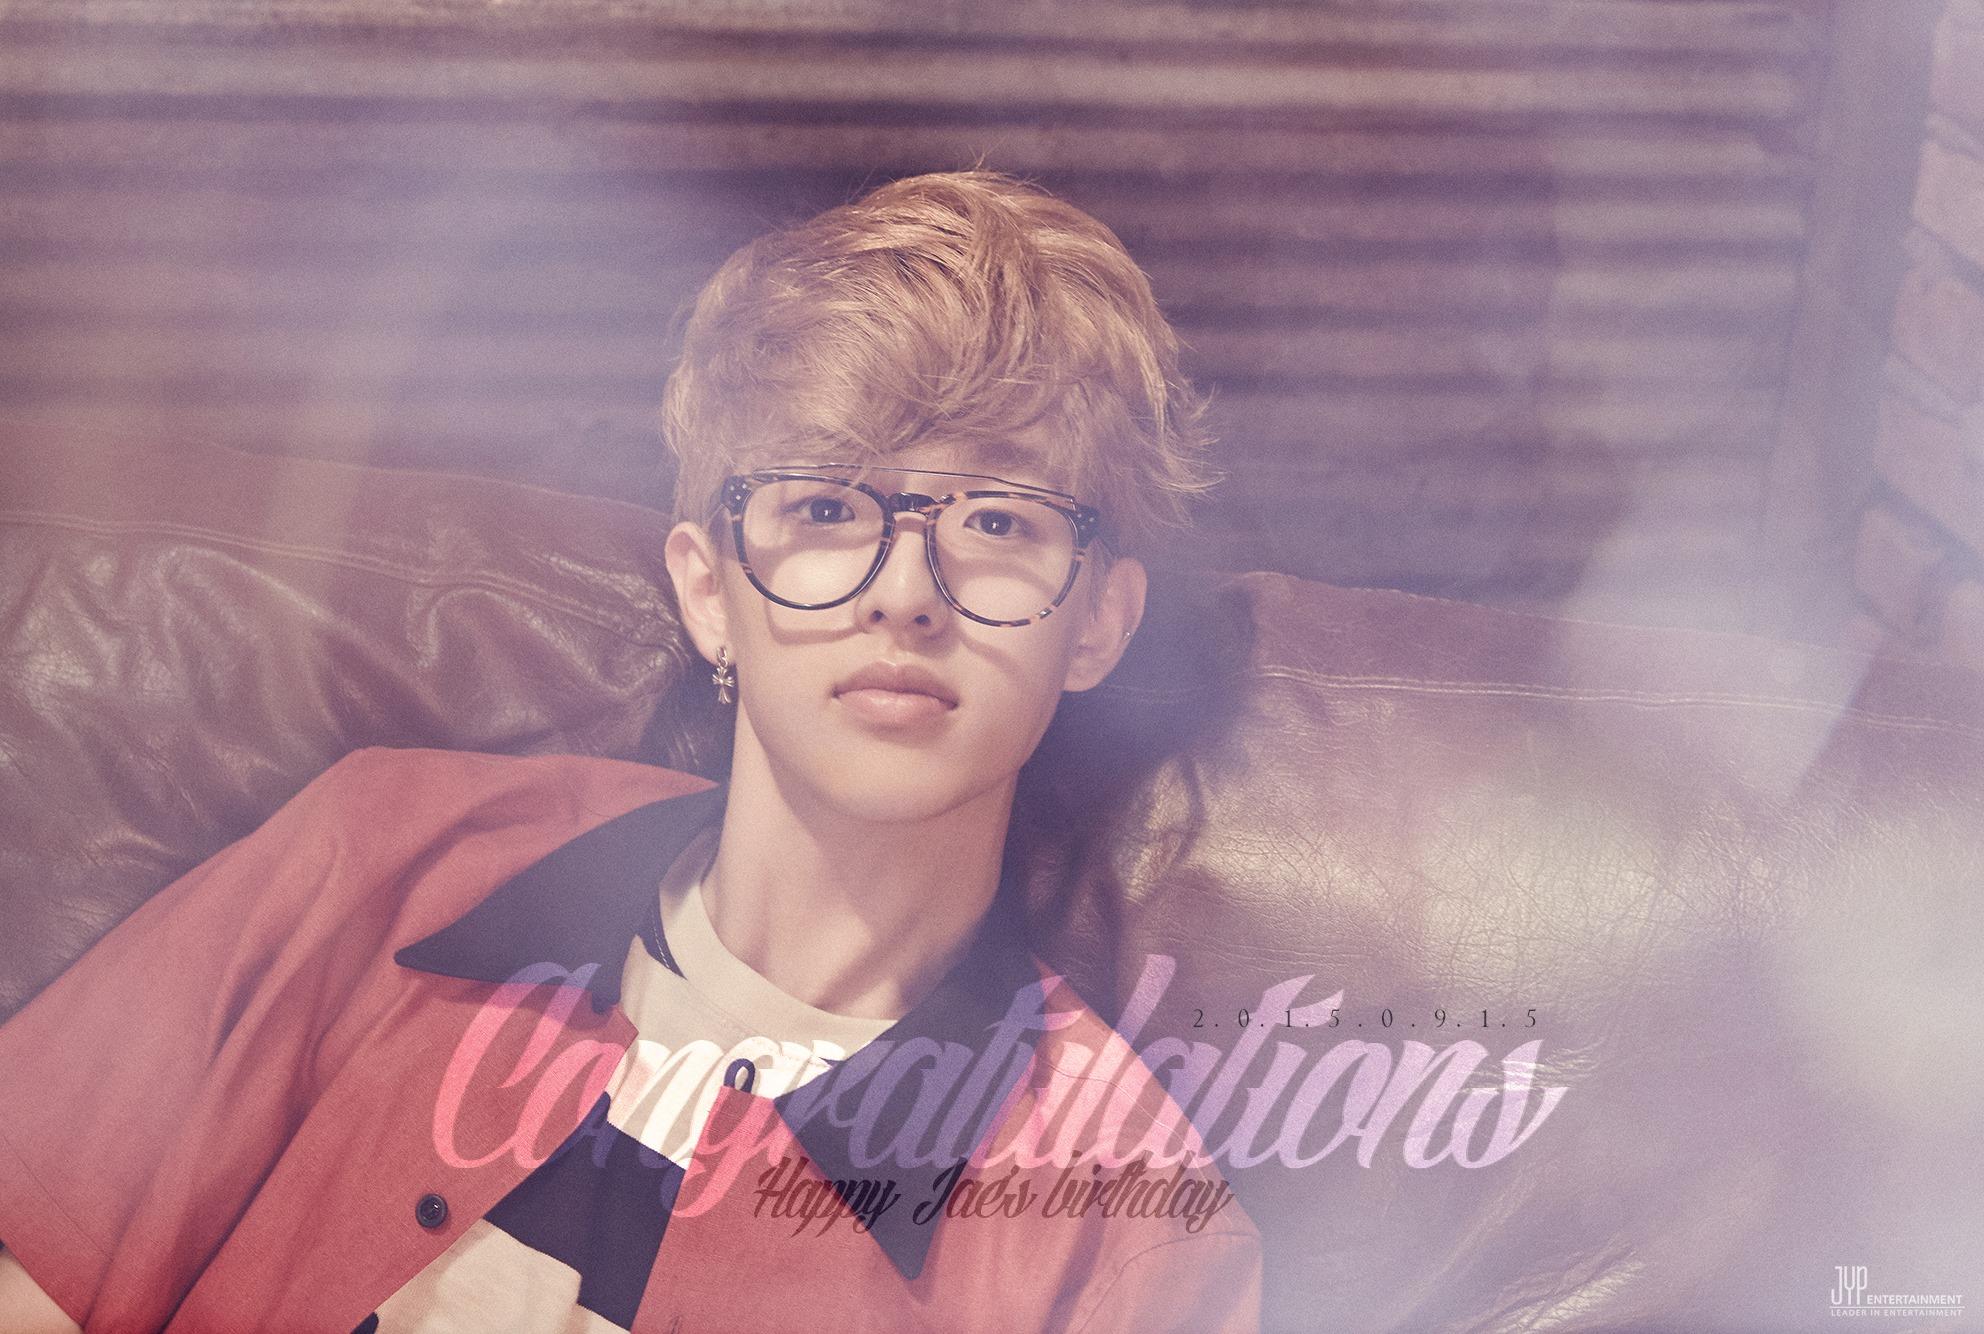 【J】JYP今年才剛推出的燒燙燙樂團Day 6,成員Jae的發音就是제이(J),因為2012年參加SBS電視台選秀節目《K-pop Star》第一季獲得第6名簽進JYP